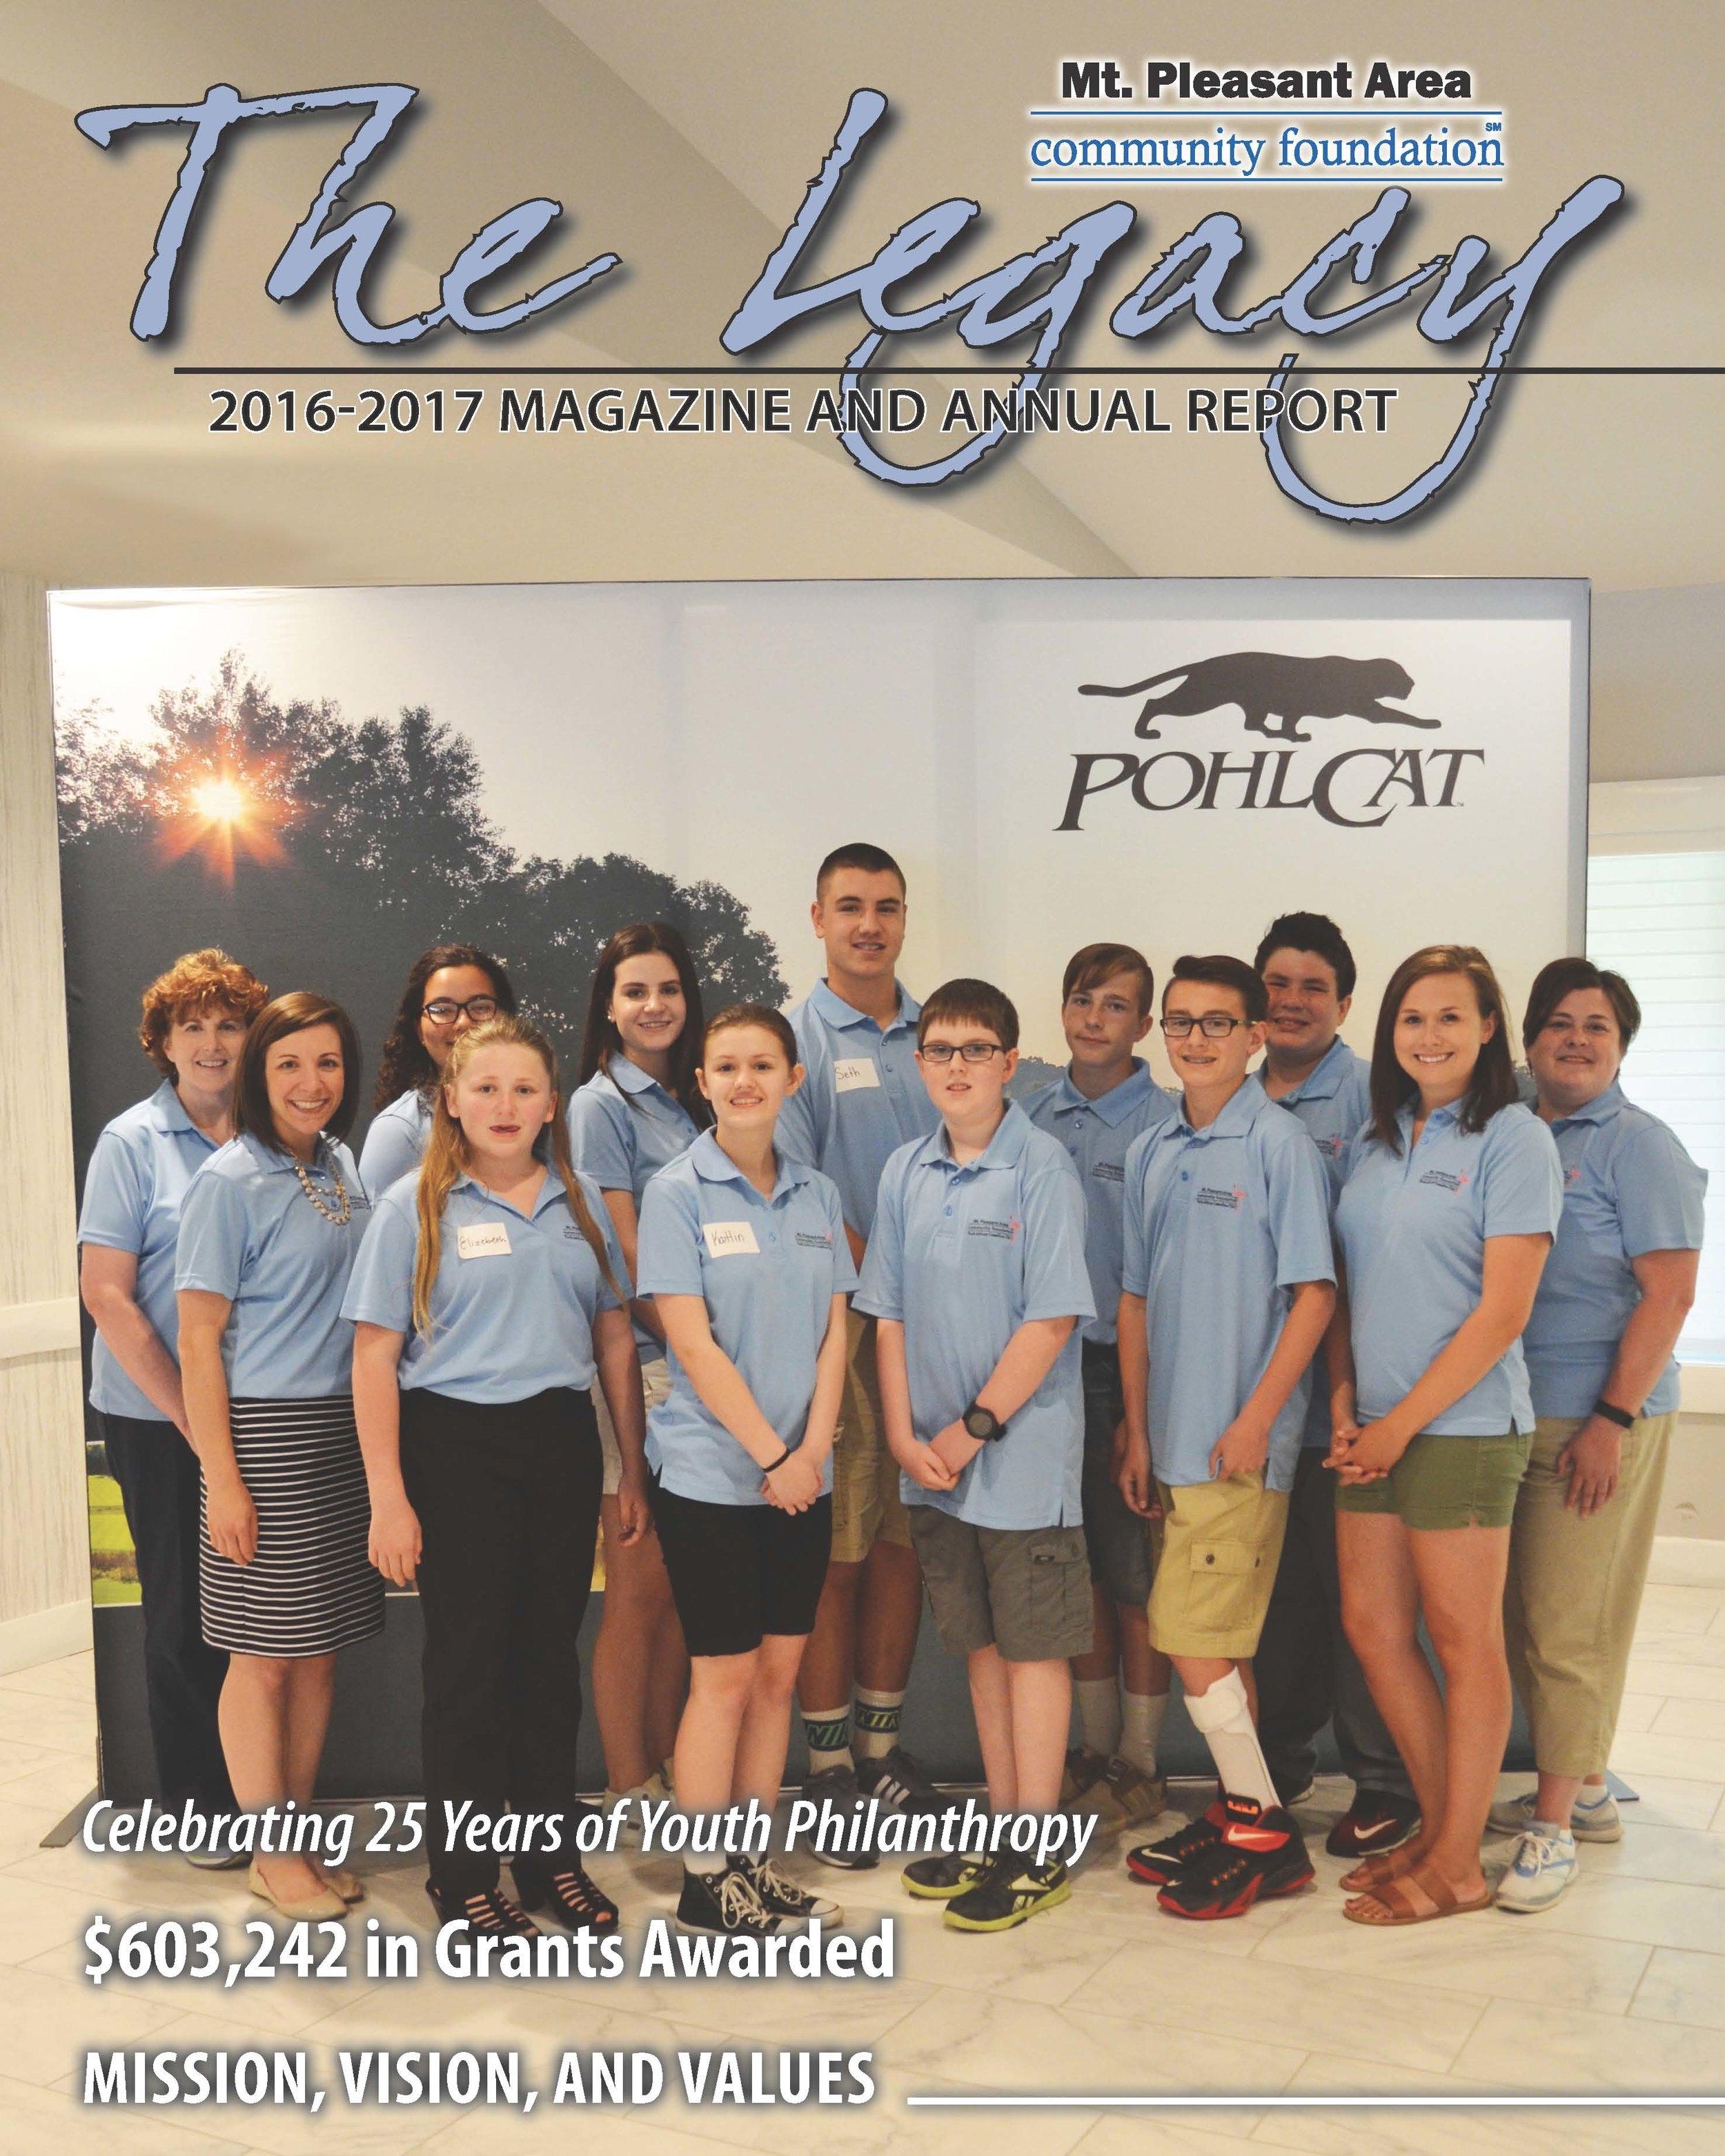 66641_2016-2017 Annual Report_MPACF_17-32_Page_01.jpg